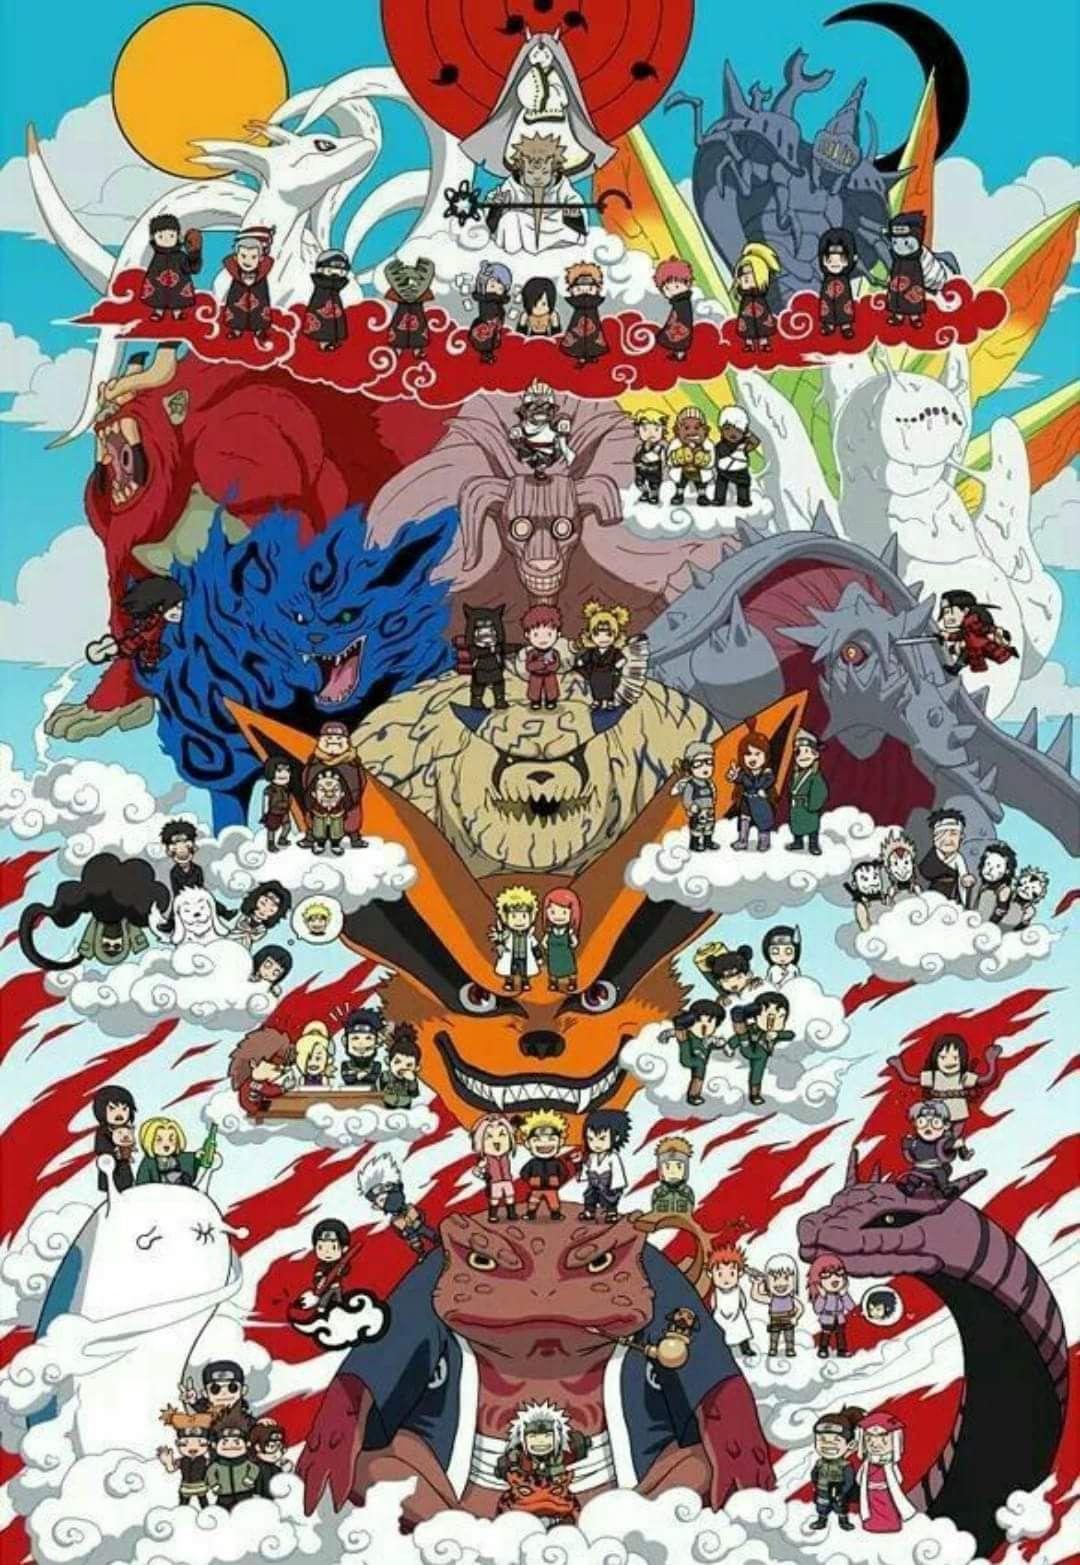 ac54cc2db0 Pin by Mirian L. on Anime & Cartoons | Naruto, Naruto shipuden, Anime